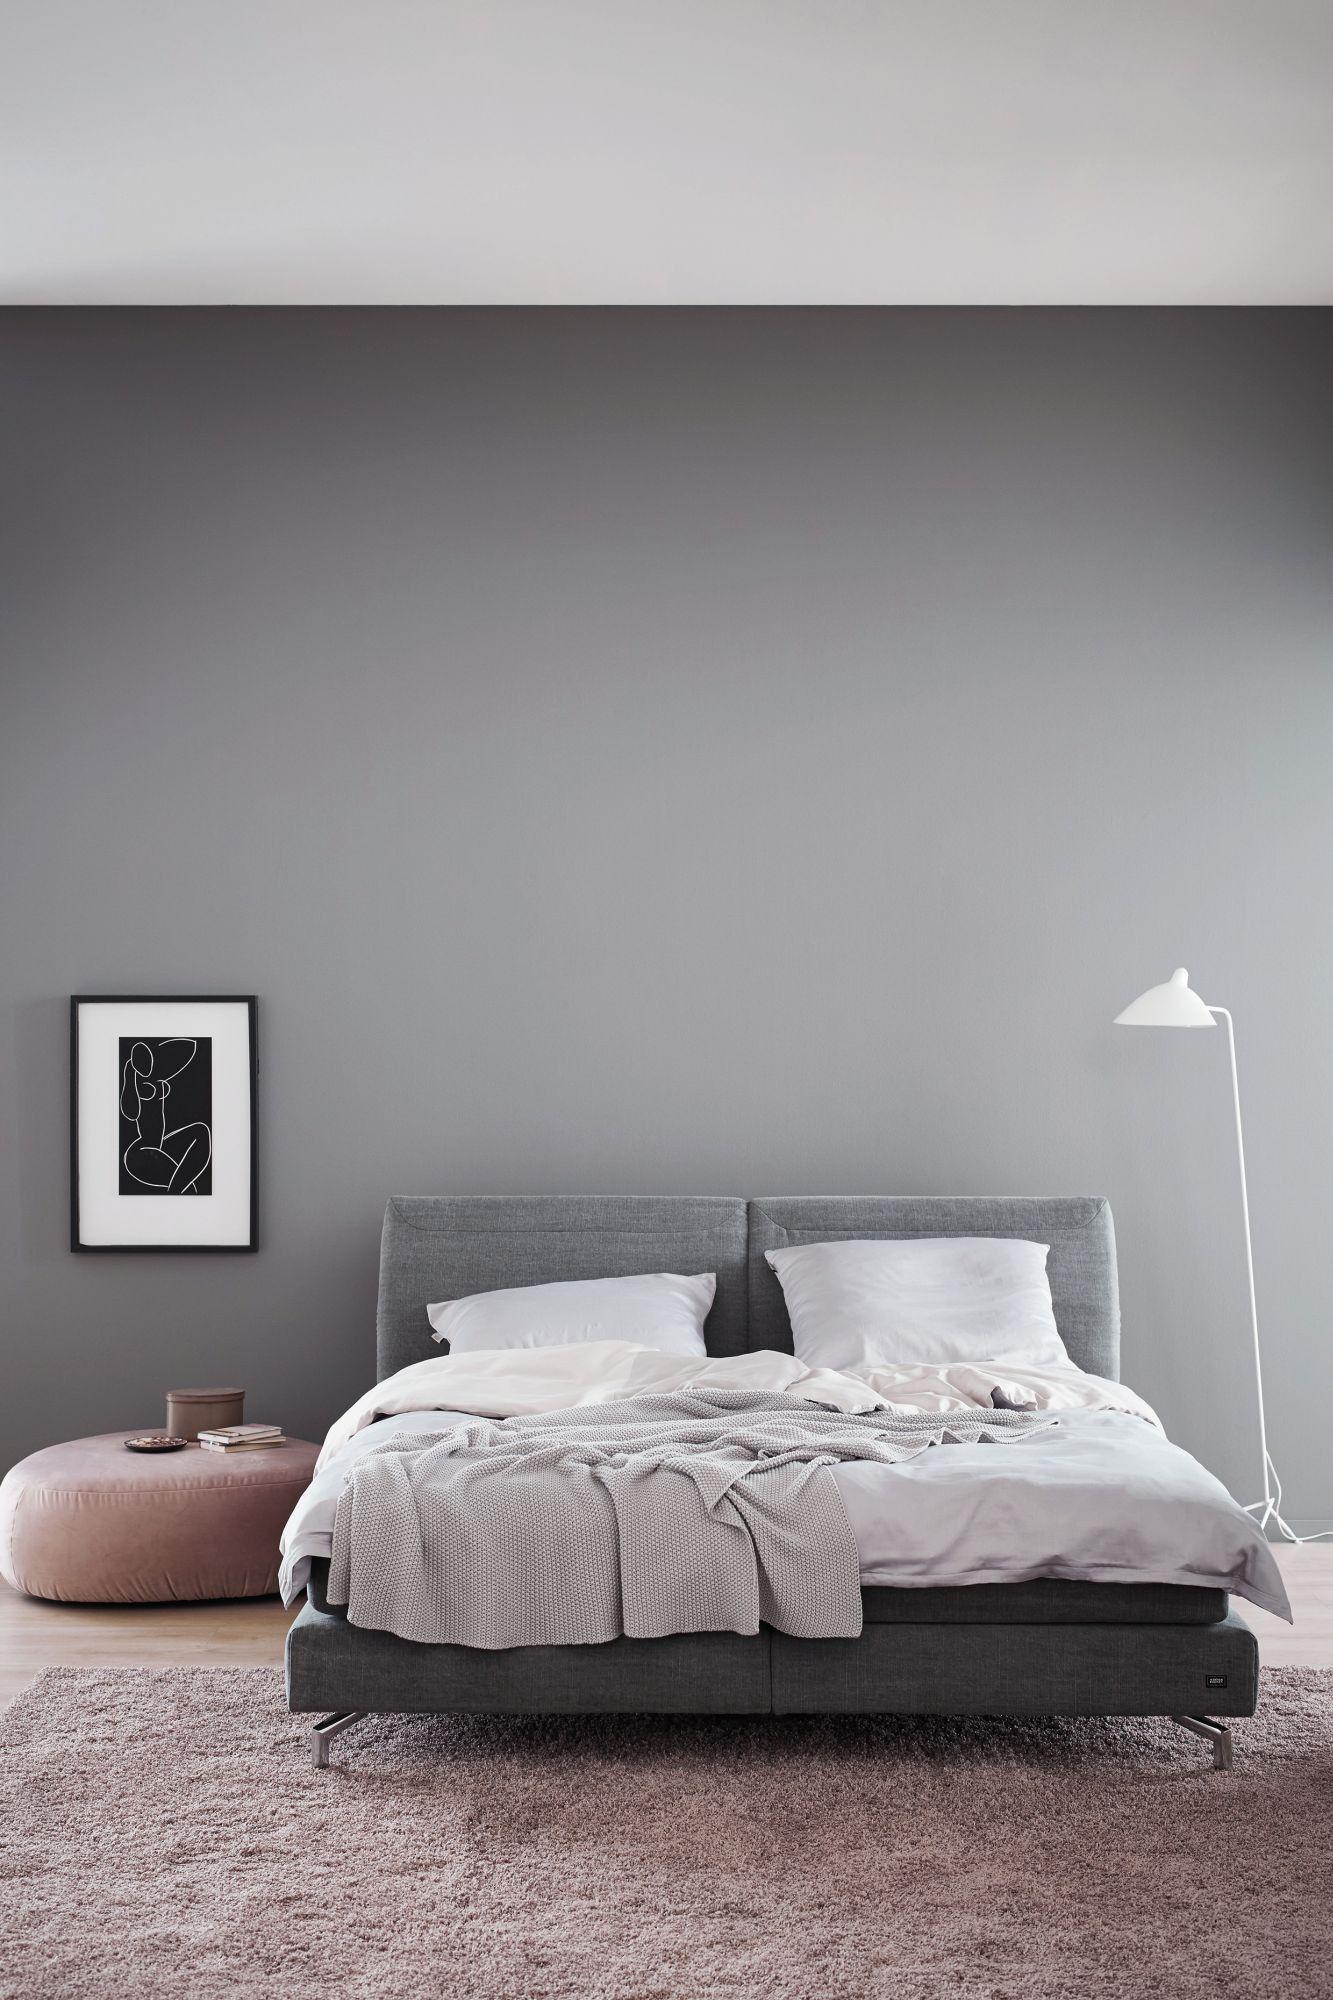 Schoner Wohnen Kollektion Boxspringbett Elegano Bed Furniture Decor